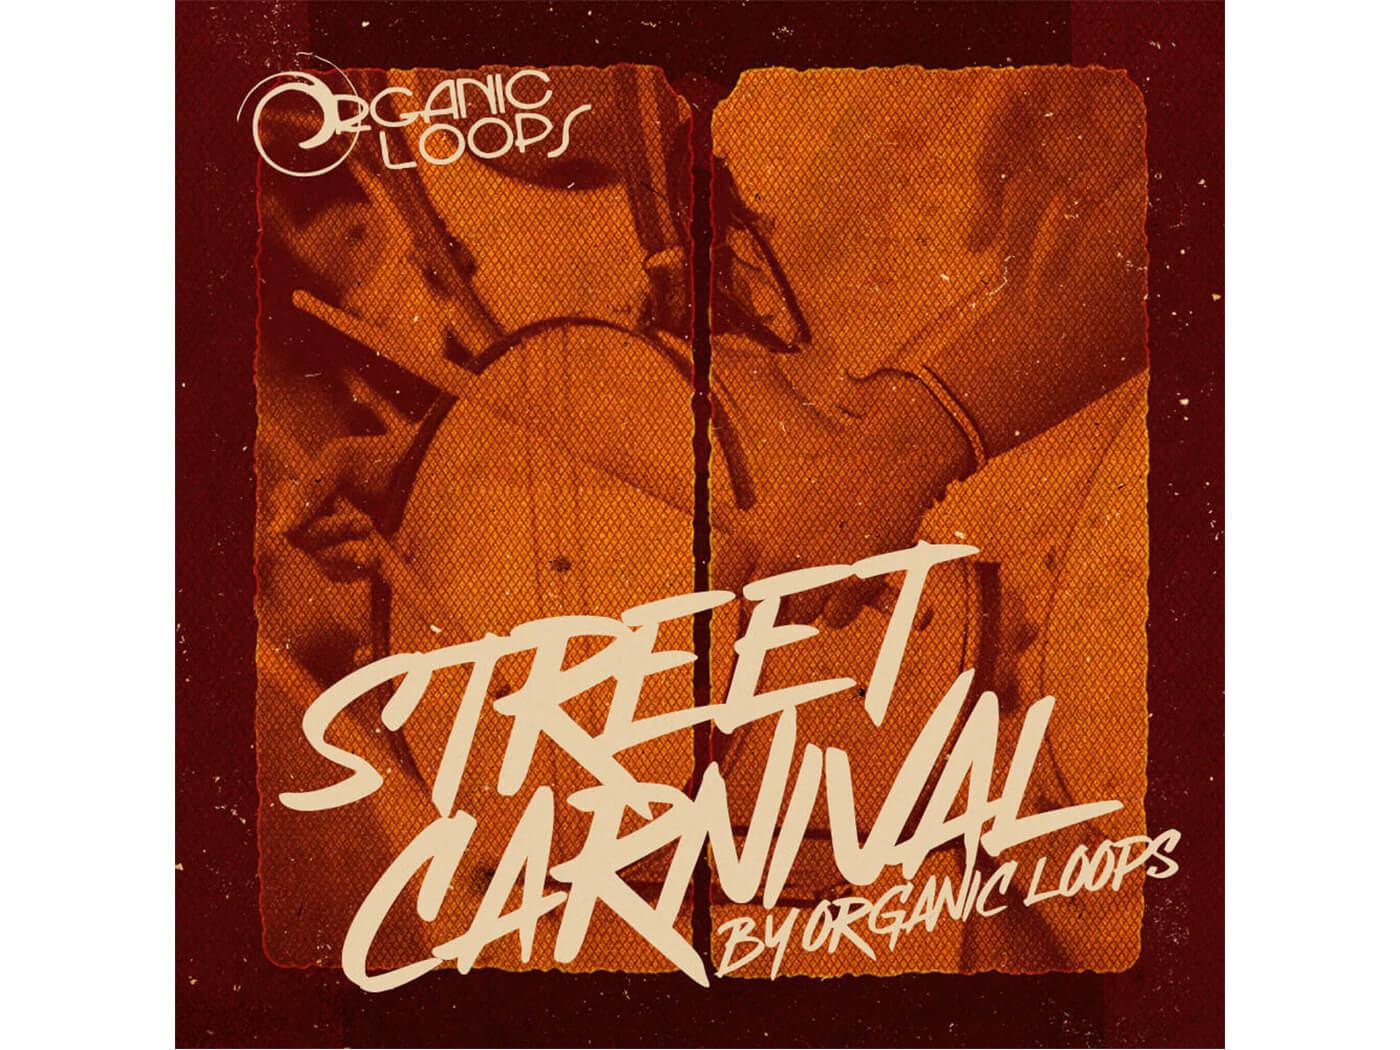 Organic Loops Street Carnival